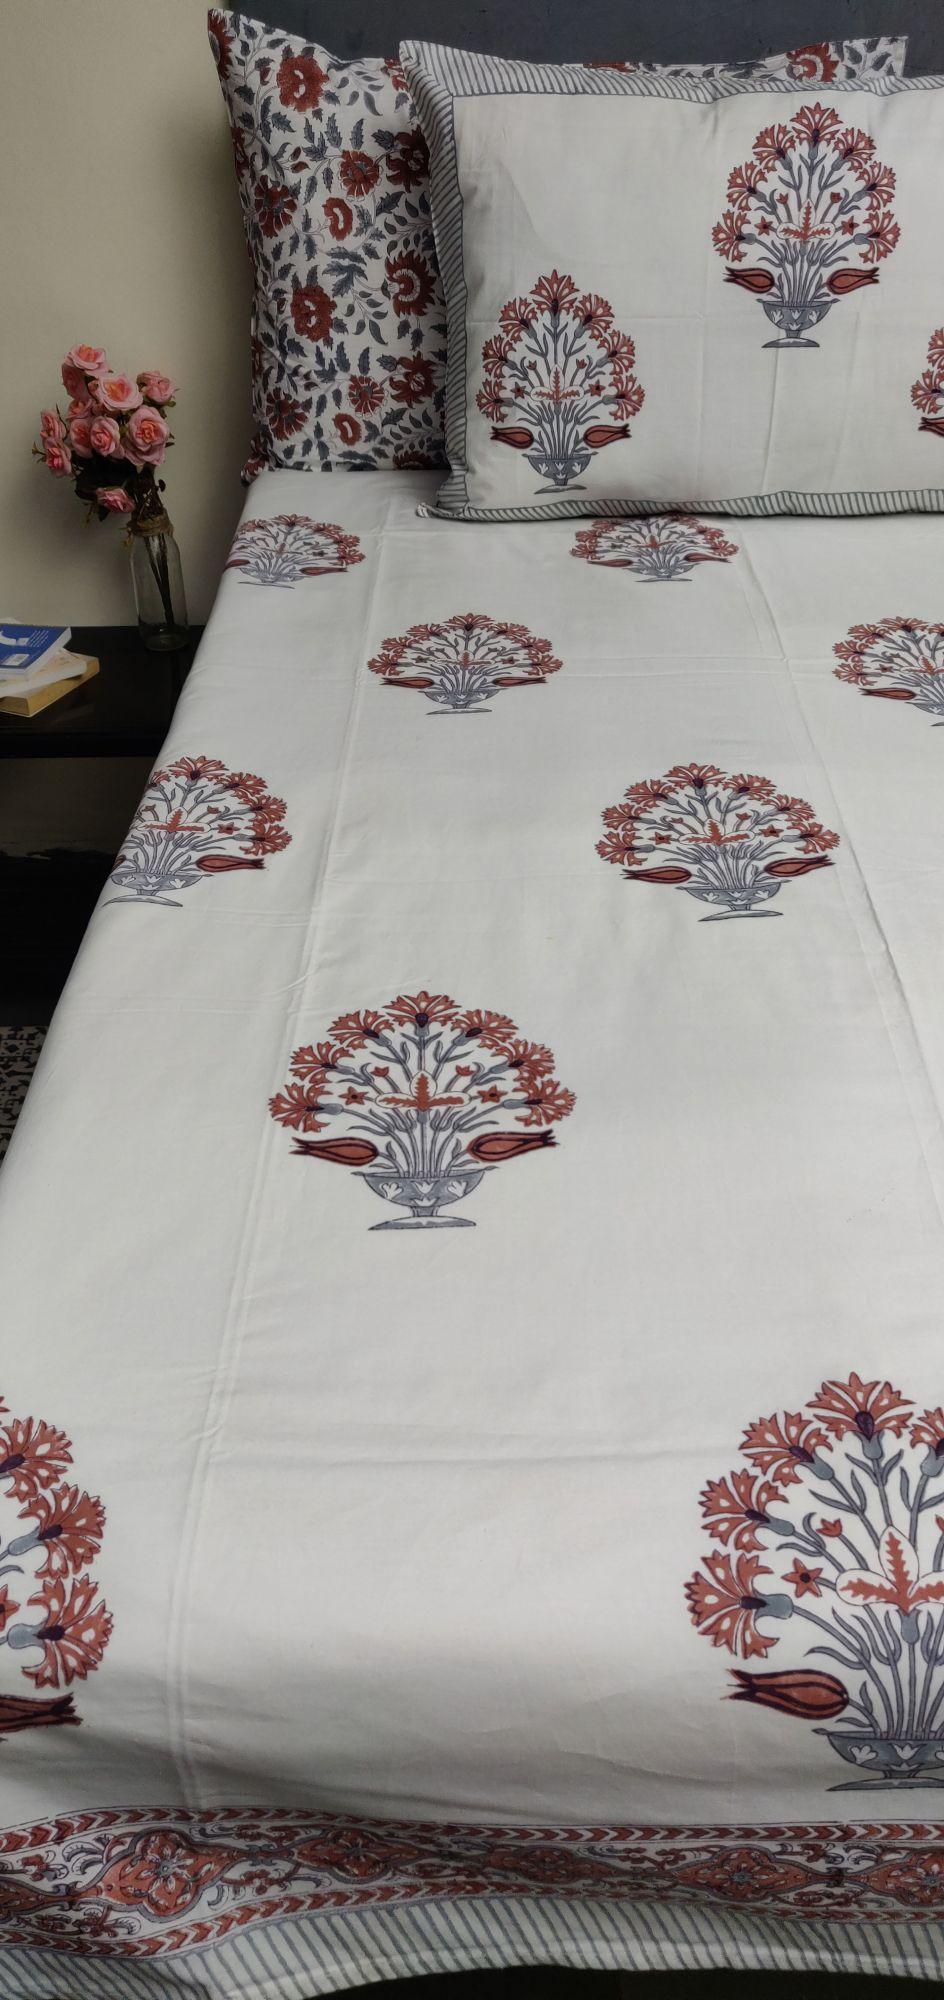 Floral Boota King Bedsheet BHK39